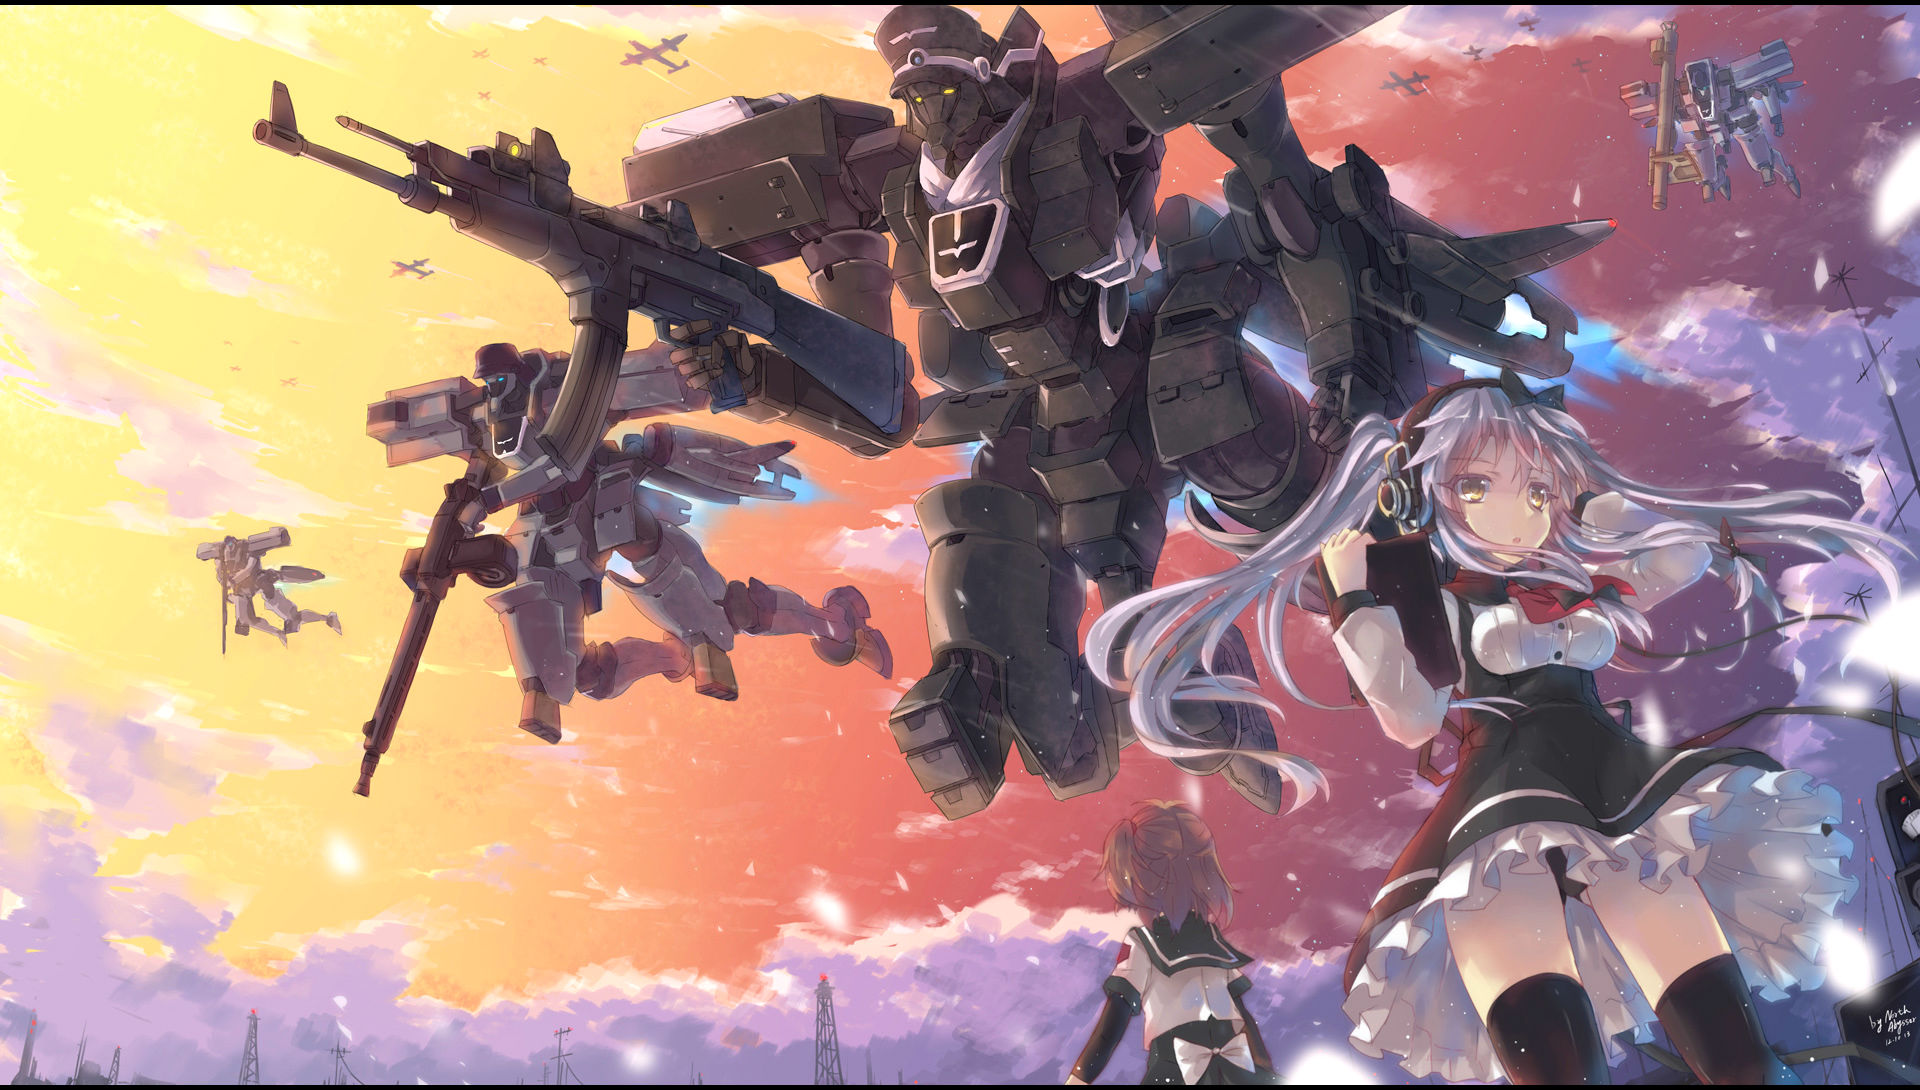 Wallpaper Engine Gun Anime Girl Original Full Hd Wallpaper And Background Image